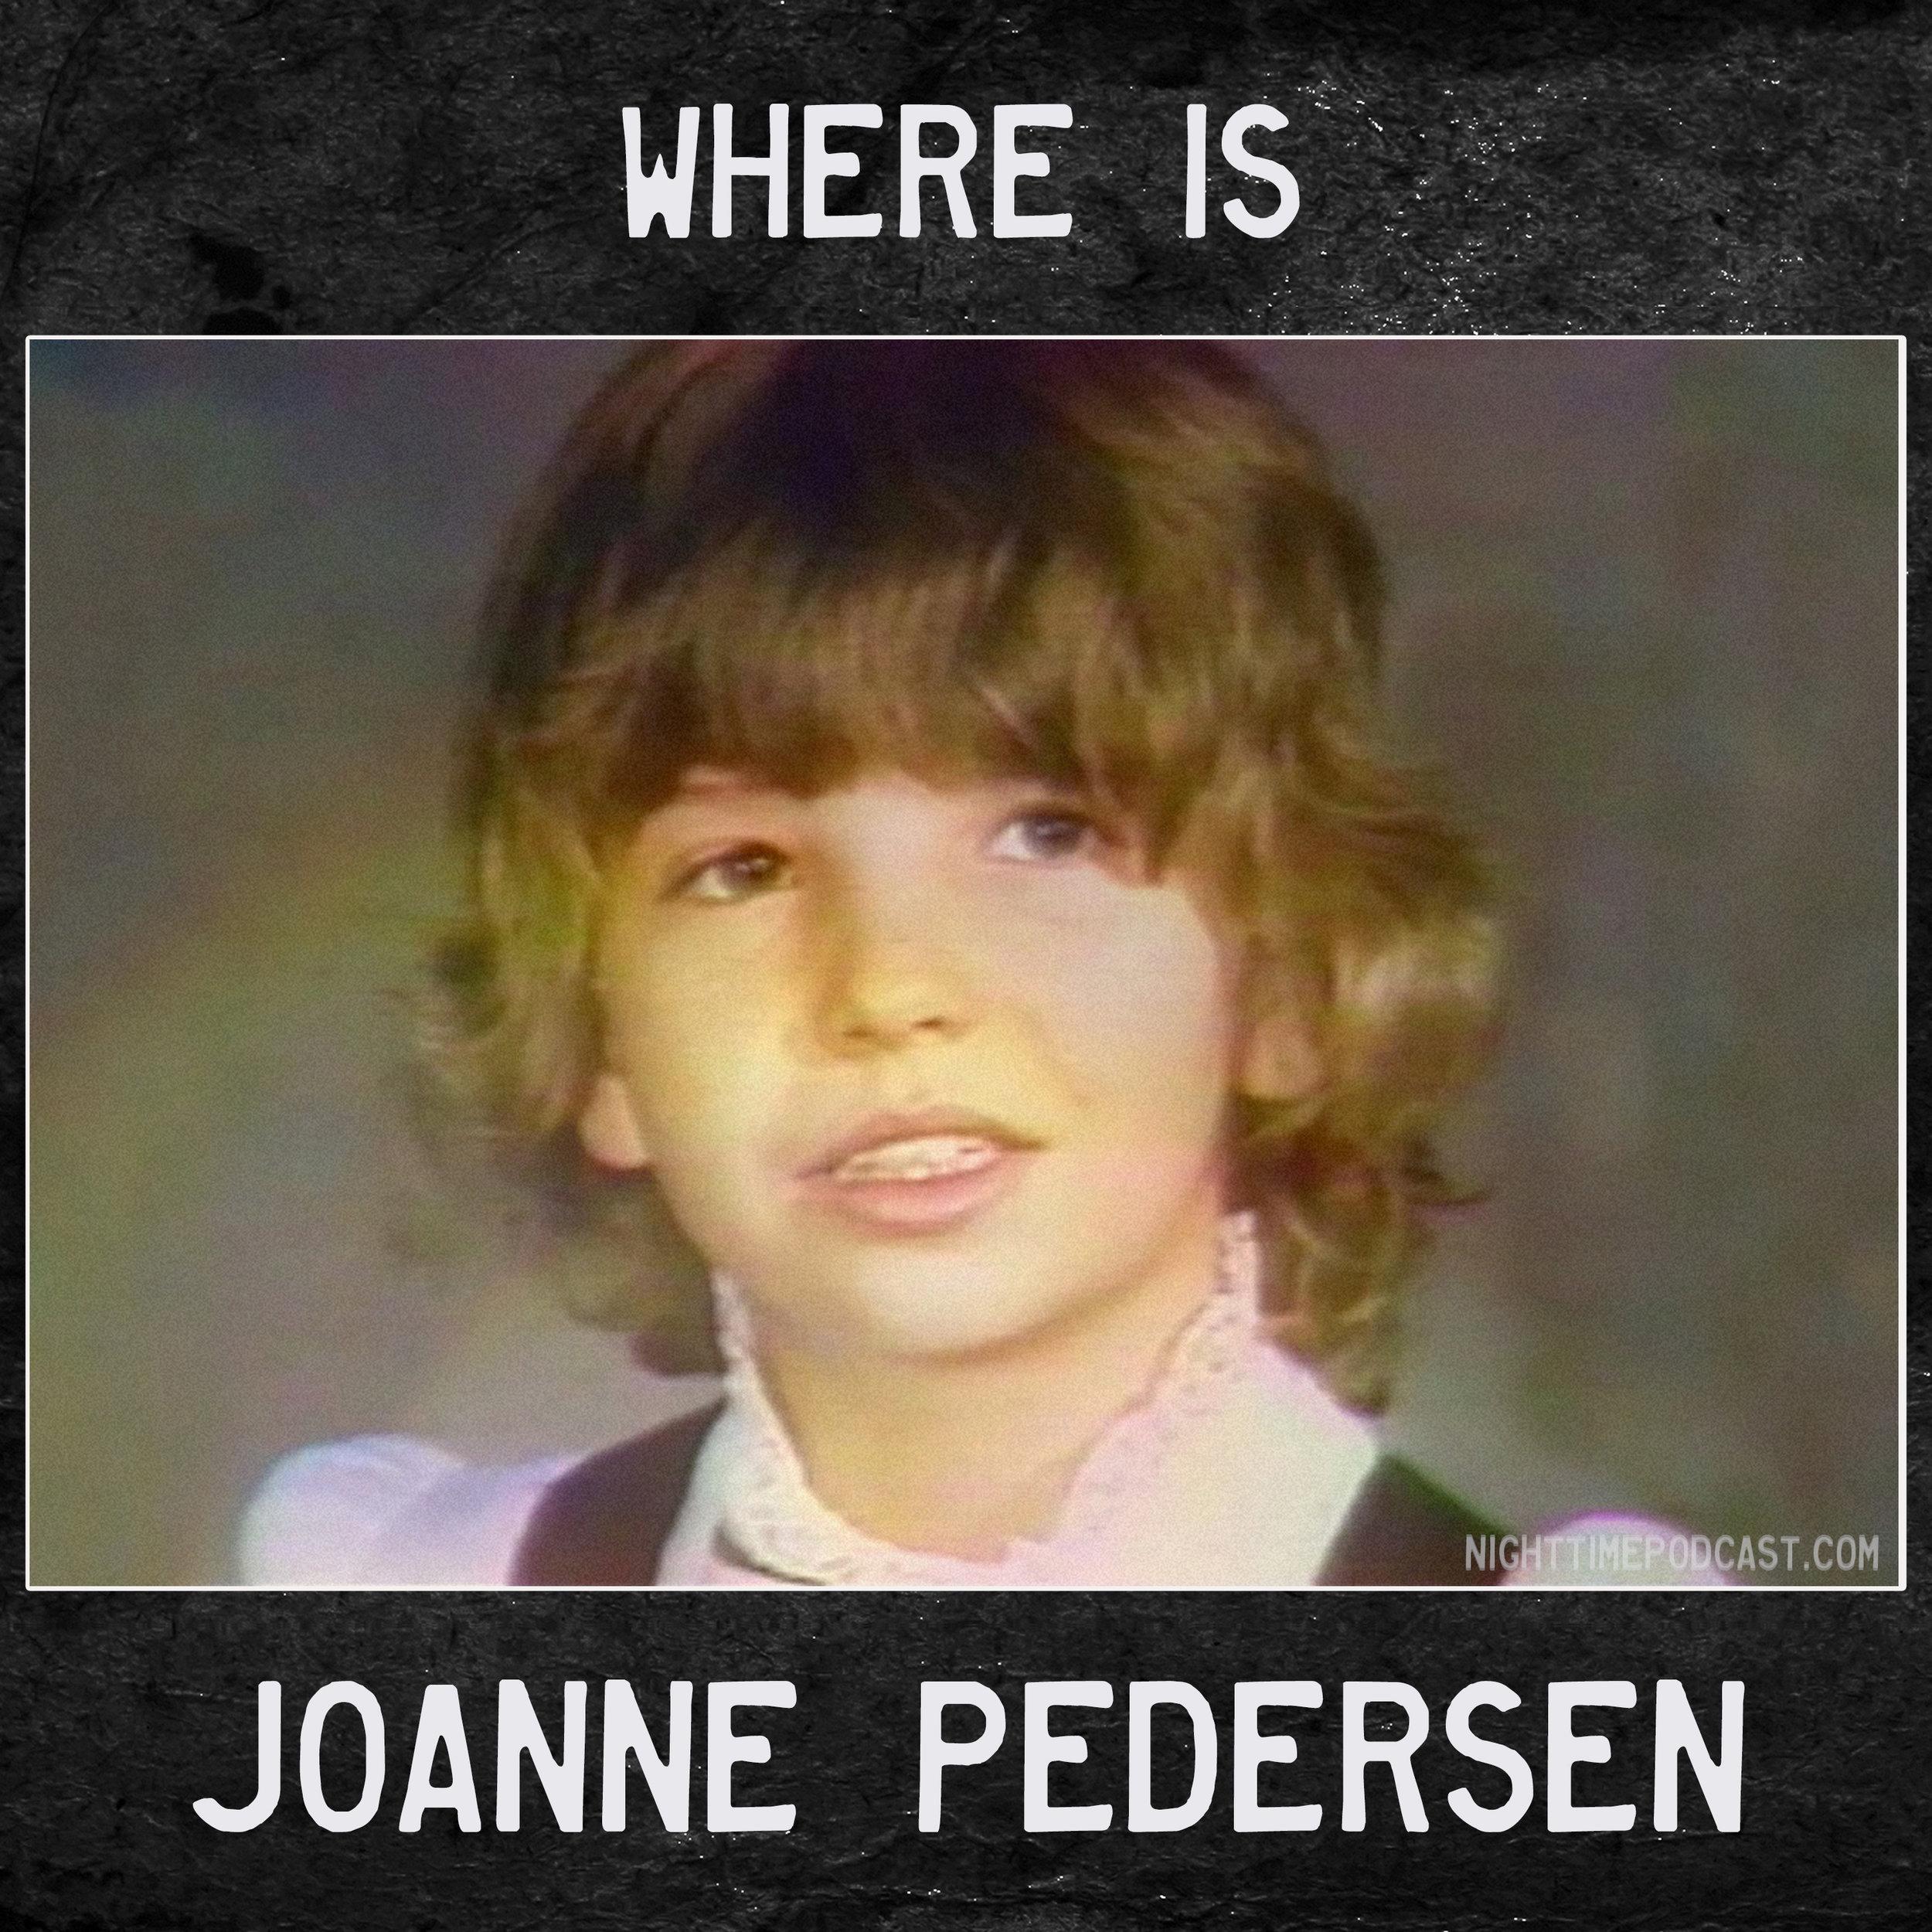 joanne pederson cover.jpg